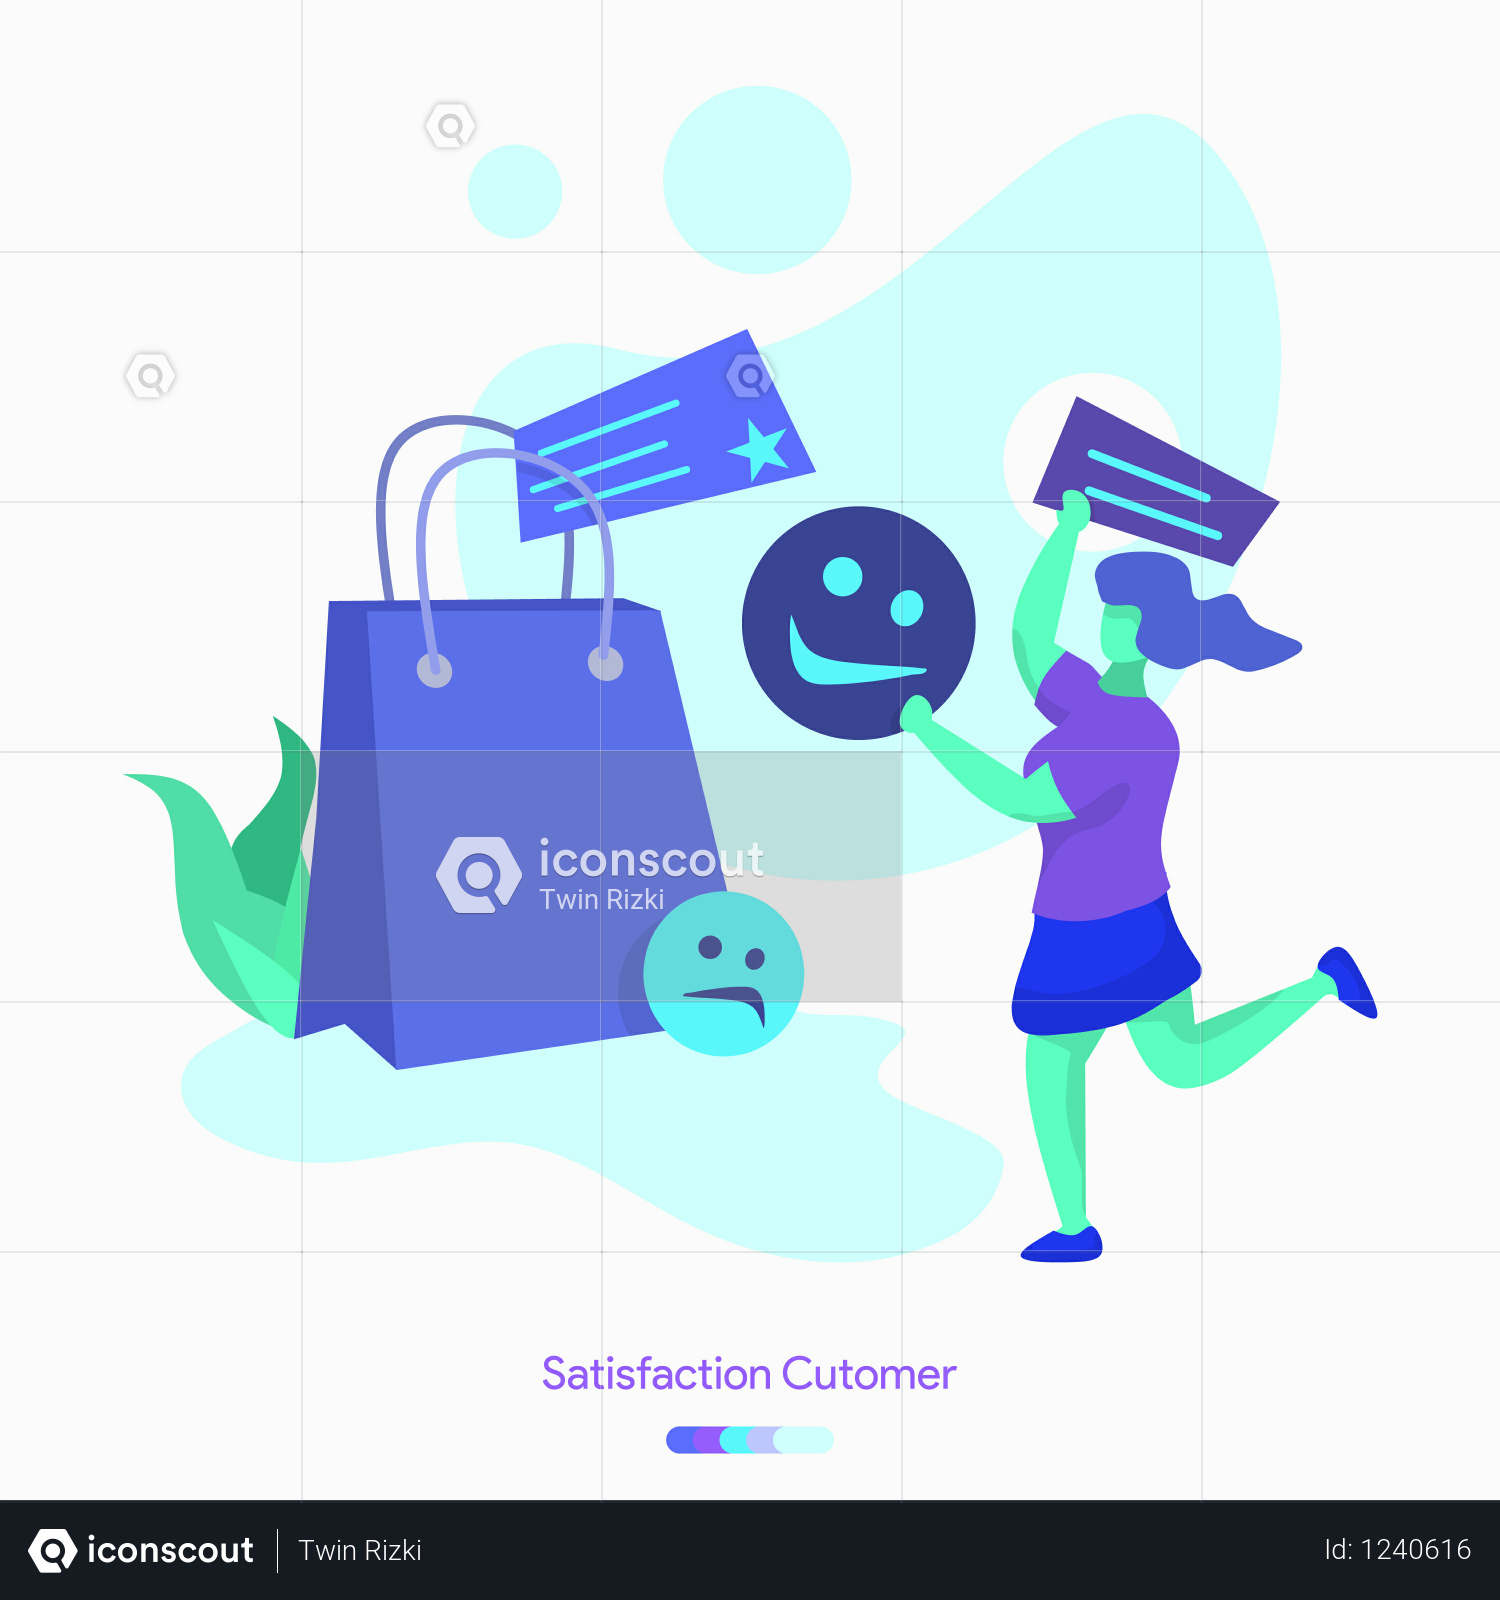 Premium Customer Satisfaction Illustration Download In Png Vector Format Communication Illustration Infographic Marketing Online Marketing Infographic